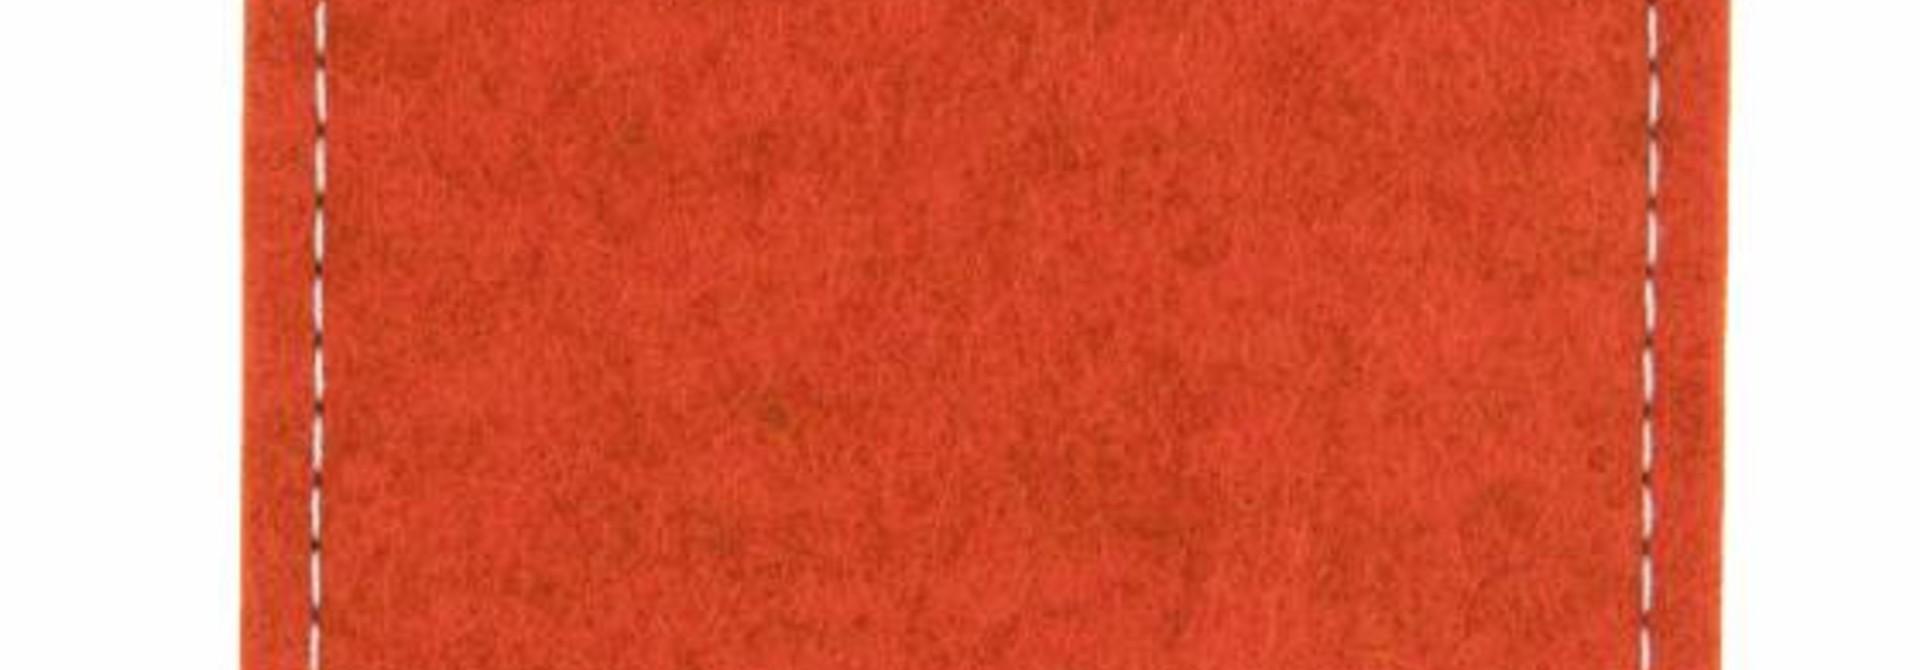 Mi / Redmi Sleeve Rost